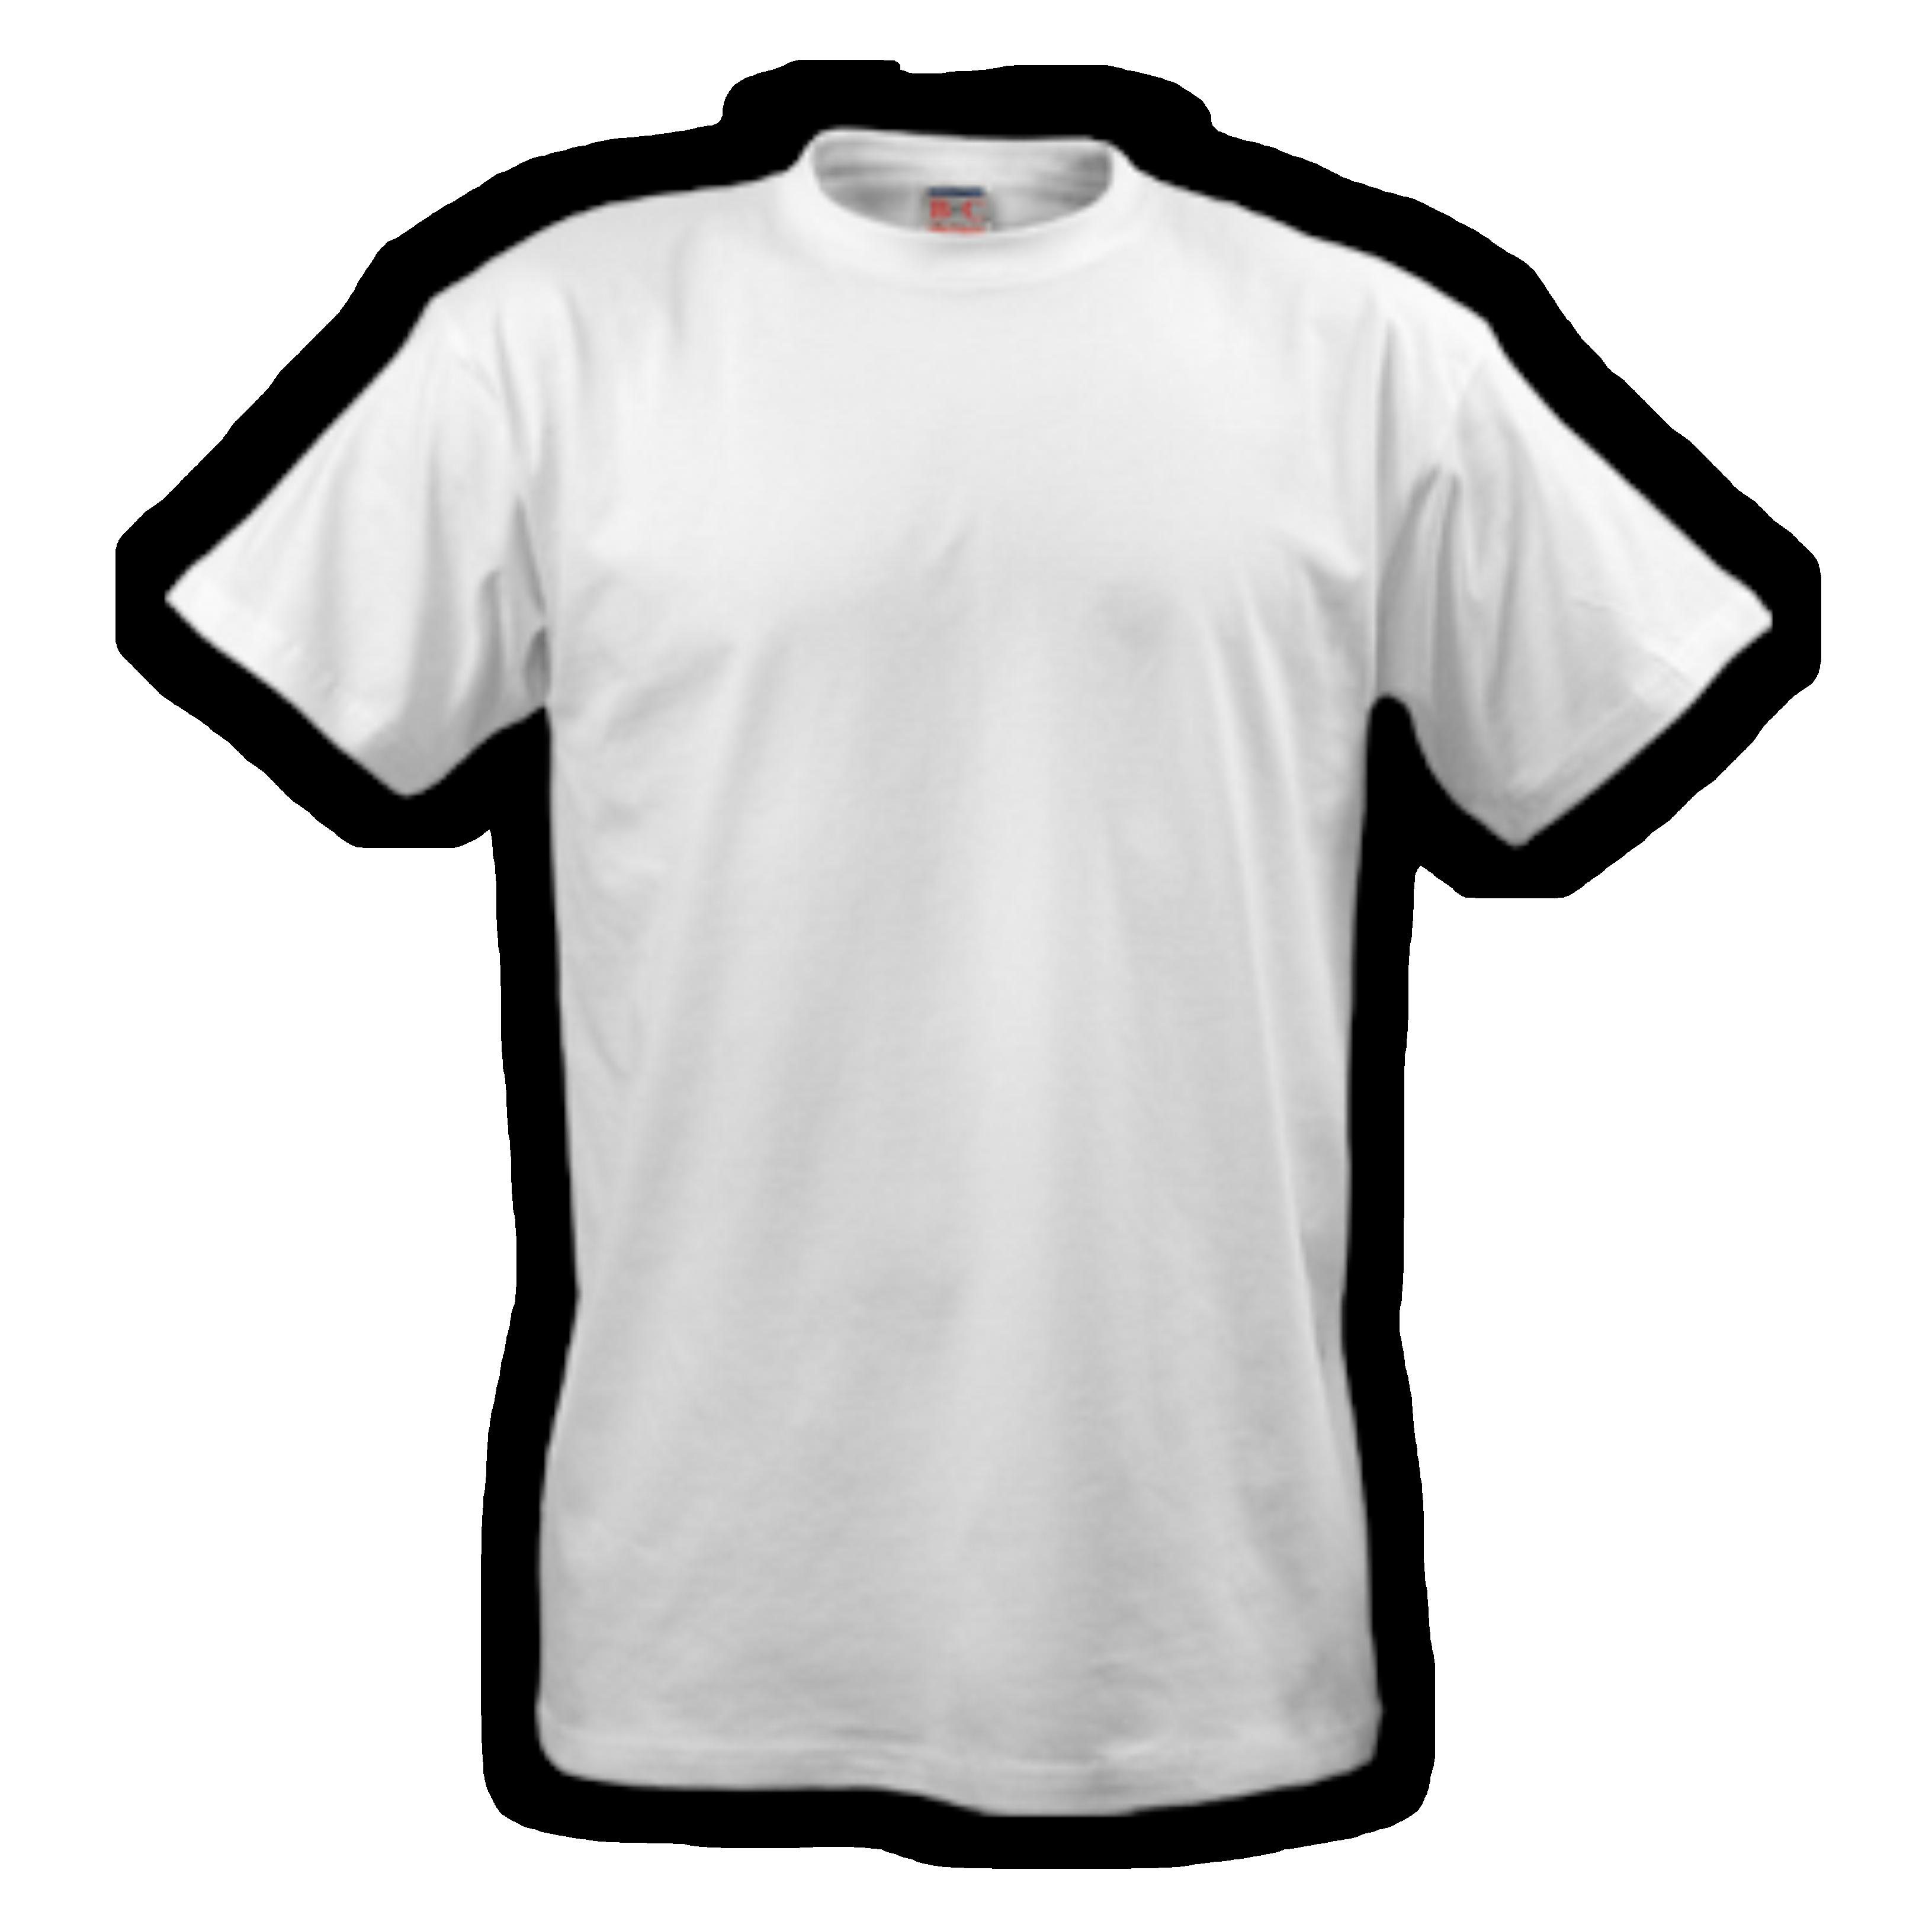 White T-Shirt PNG Image